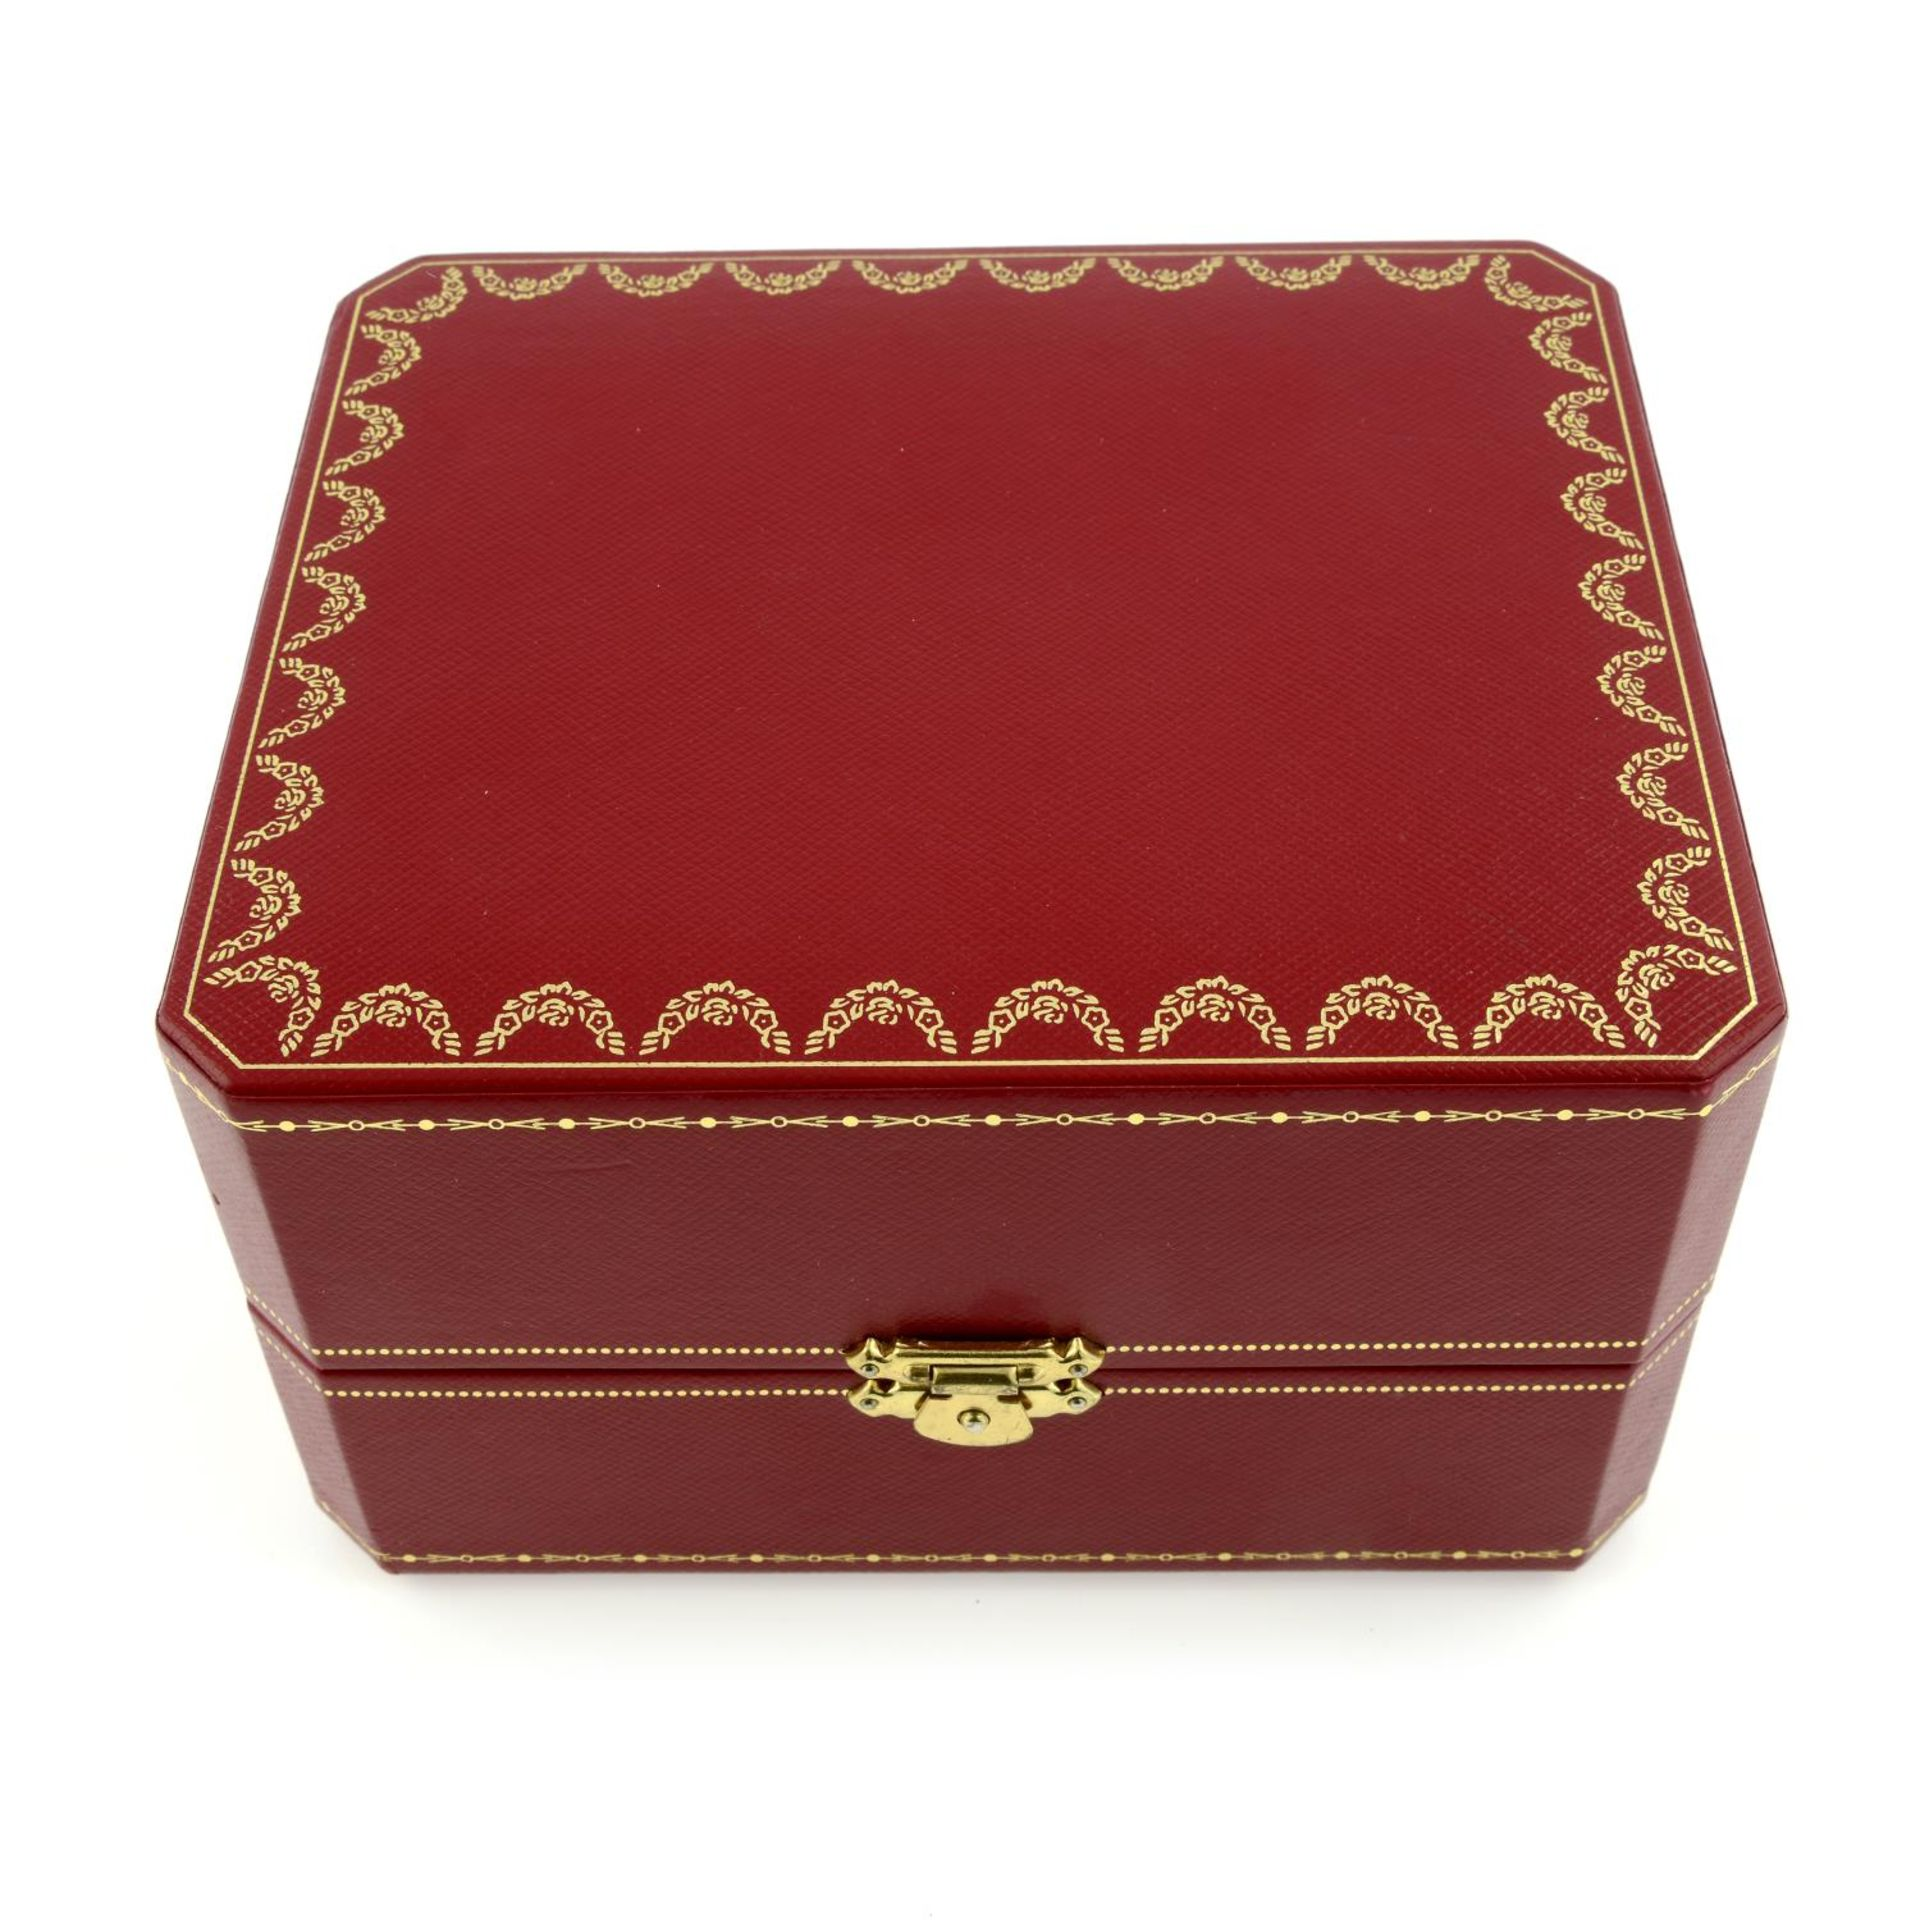 CARTIER - a Calibre de Cartier wrist watch. - Bild 6 aus 6